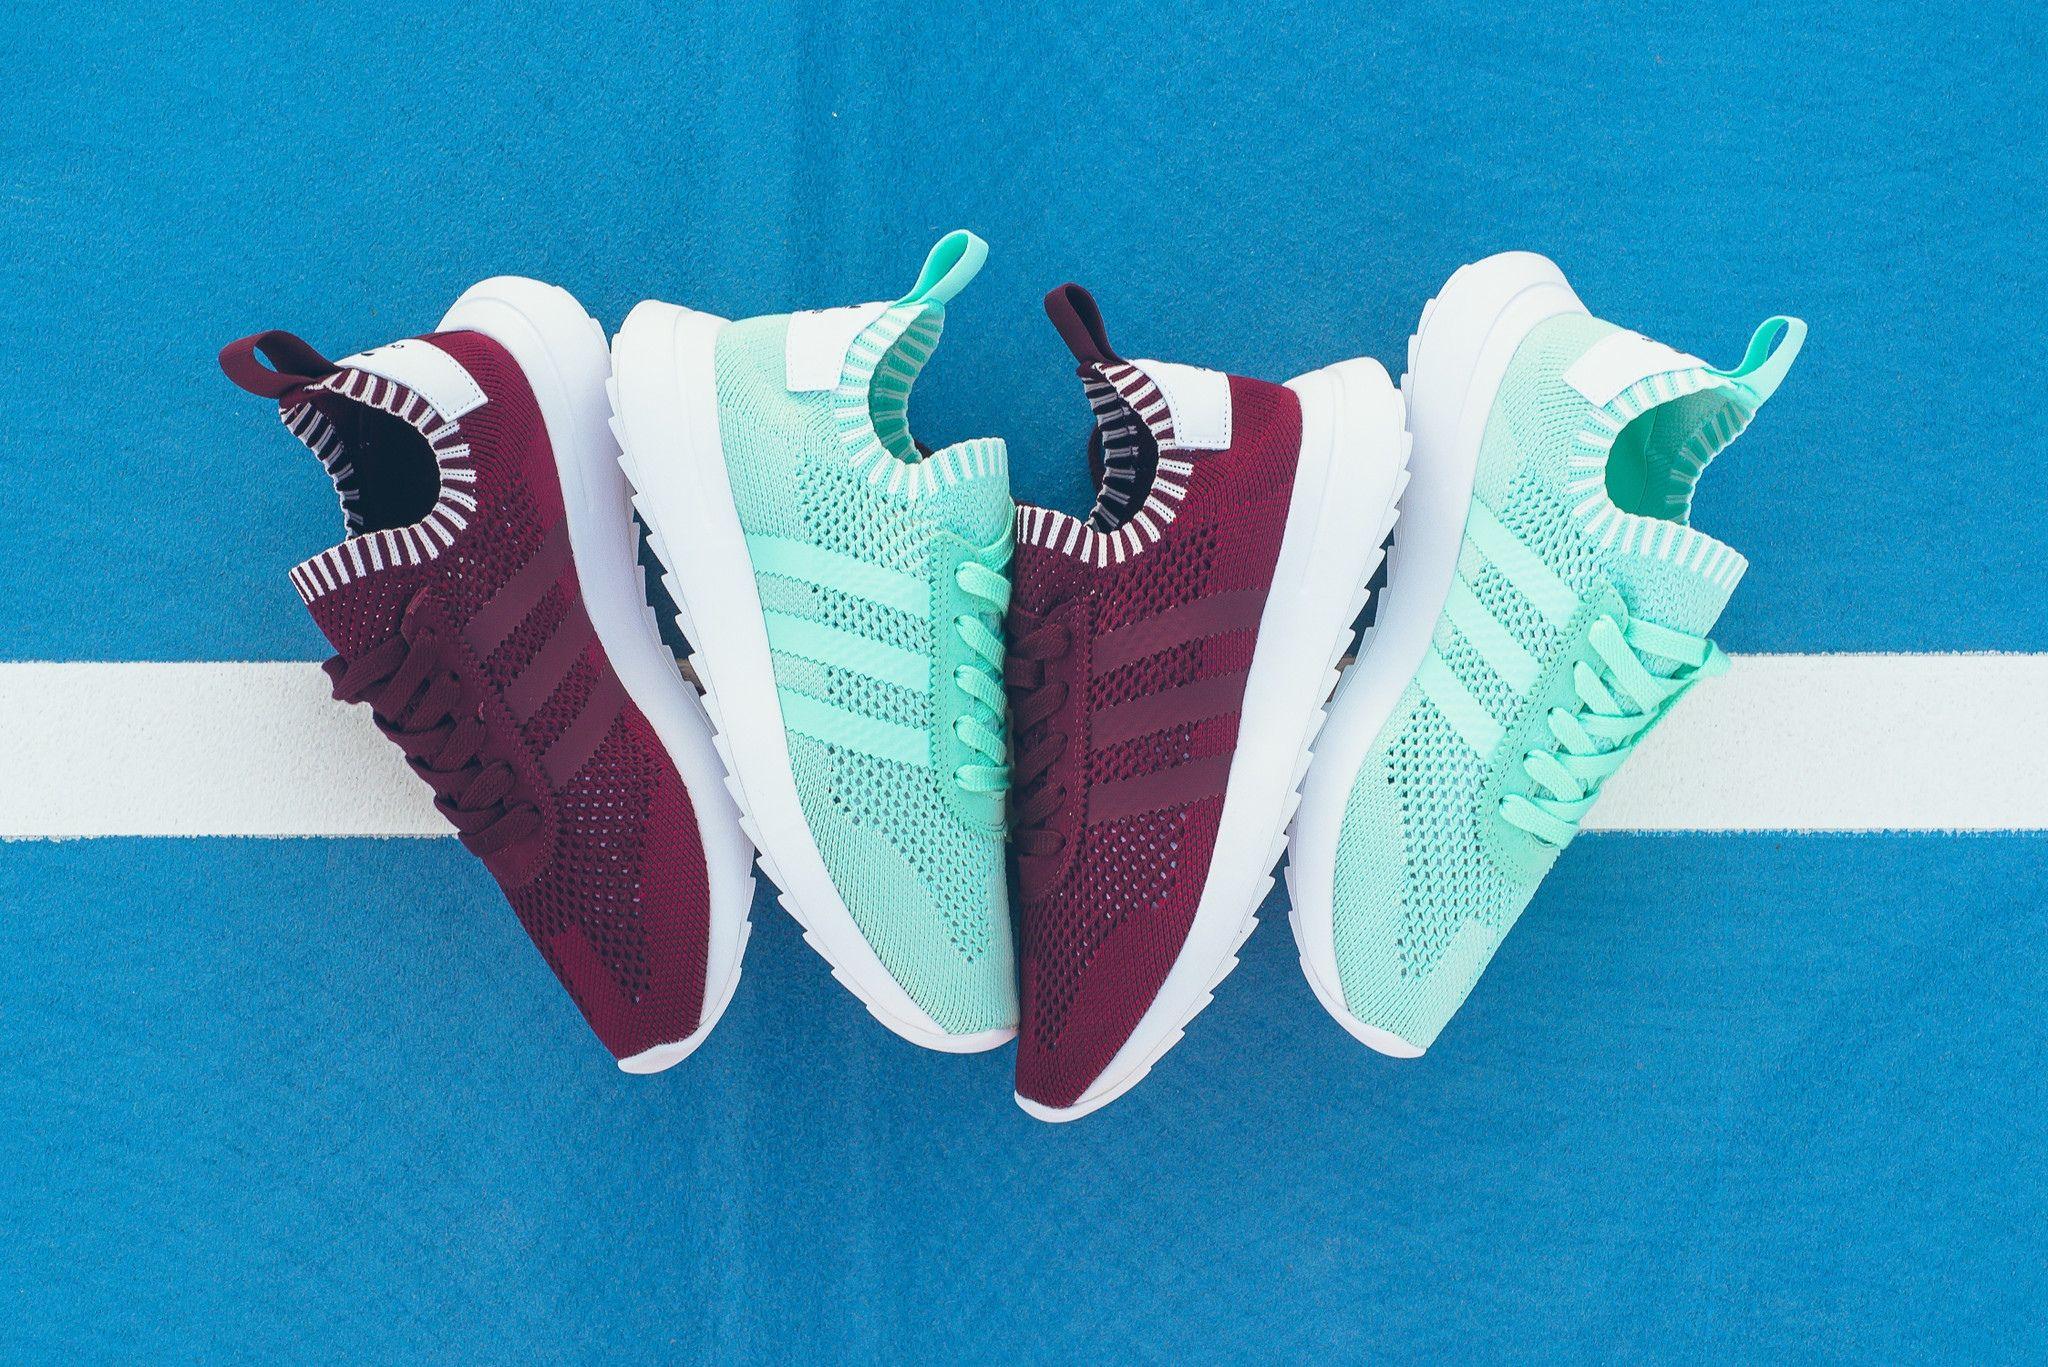 Wmns Adidas Womens Flashback Primeknit Pk Sneaker Politics Hyebeast 2